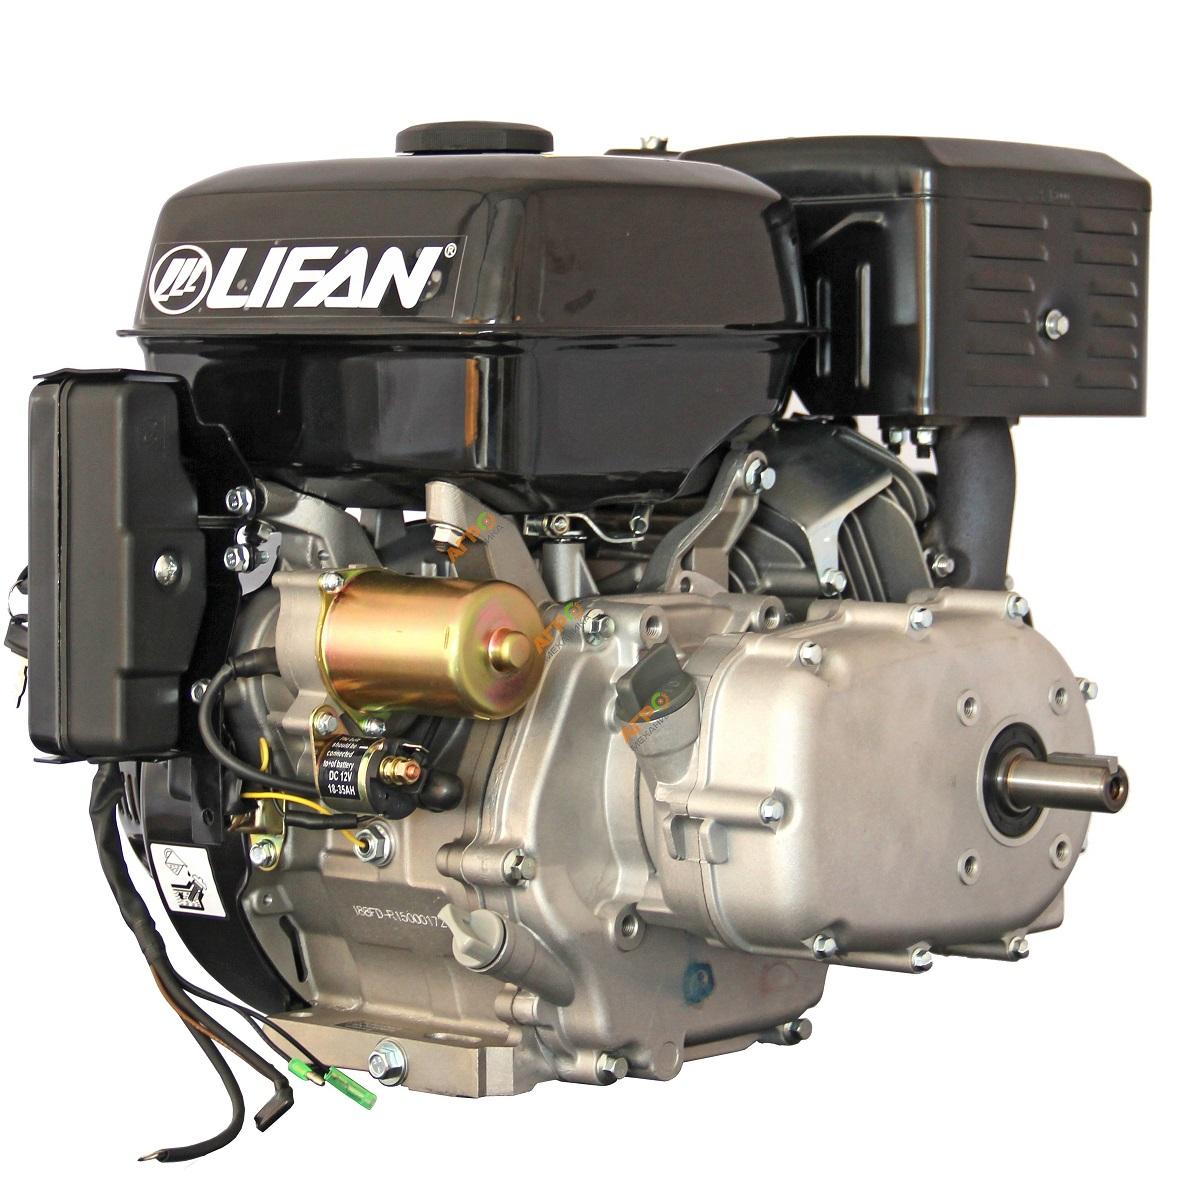 двигатель LIFAN 177 FD-R (9 л.с. электро, сцеплеие)